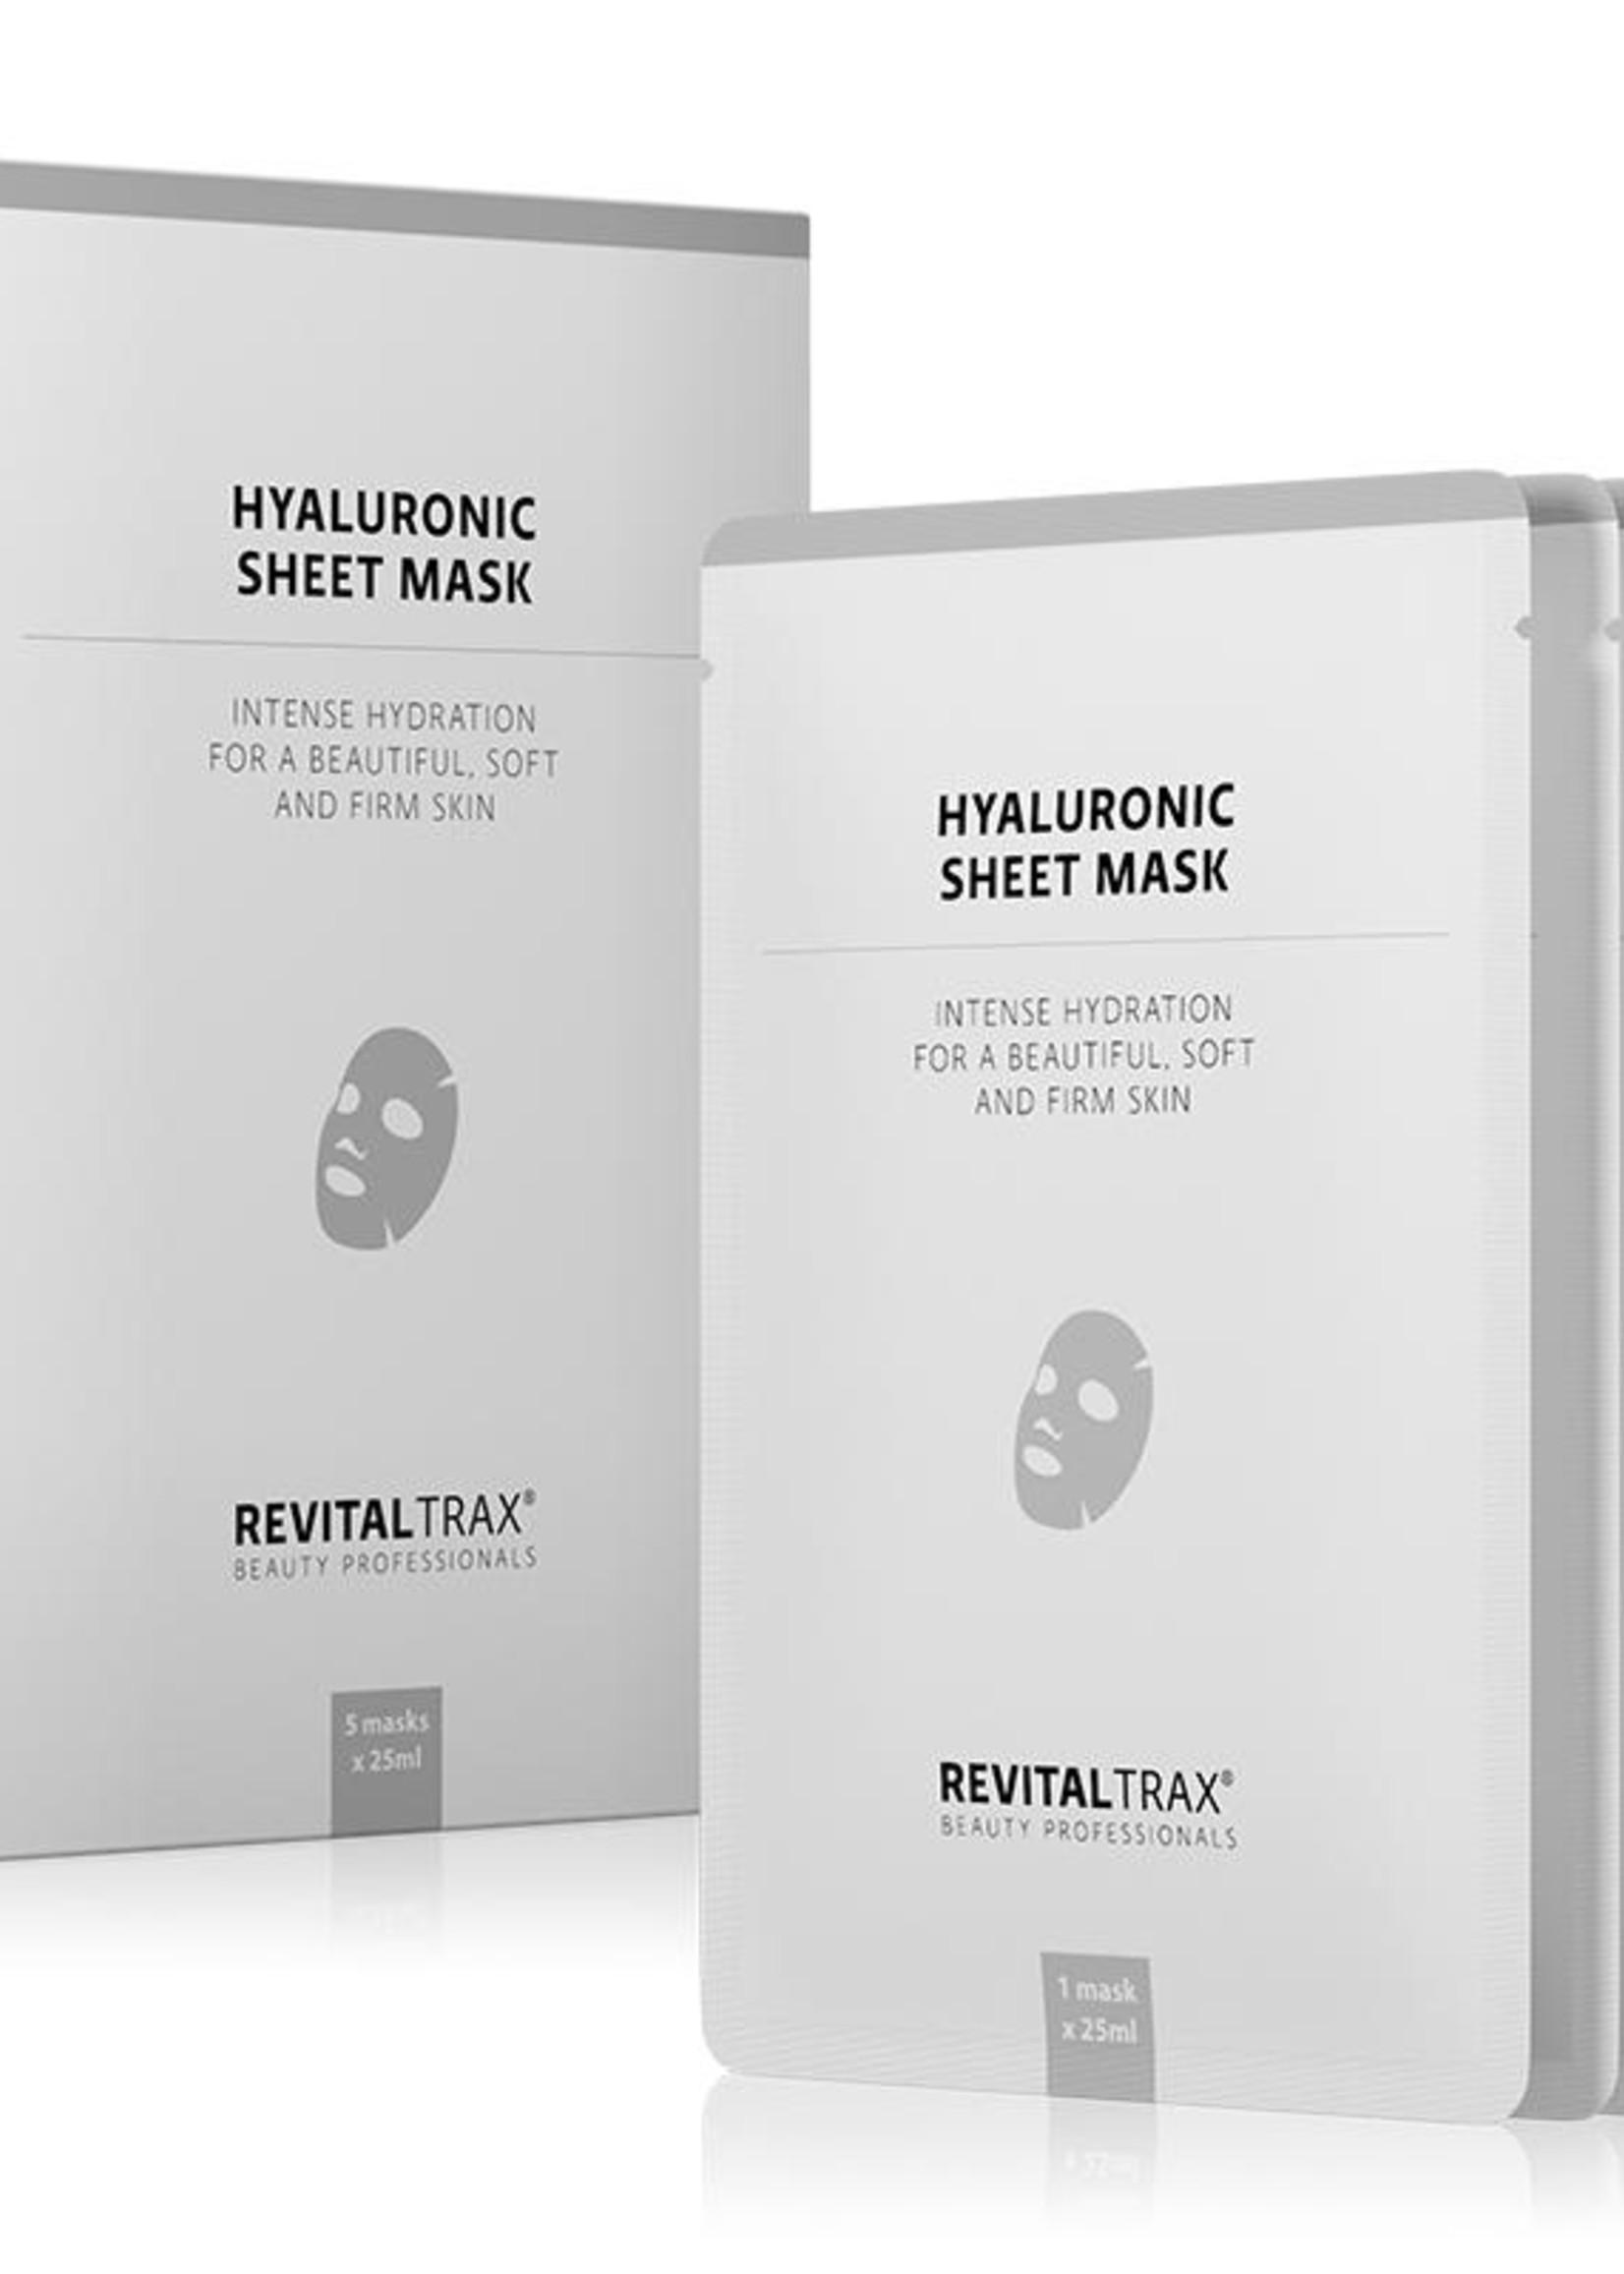 Revitaltrax Hyaloronic Sheet Mask